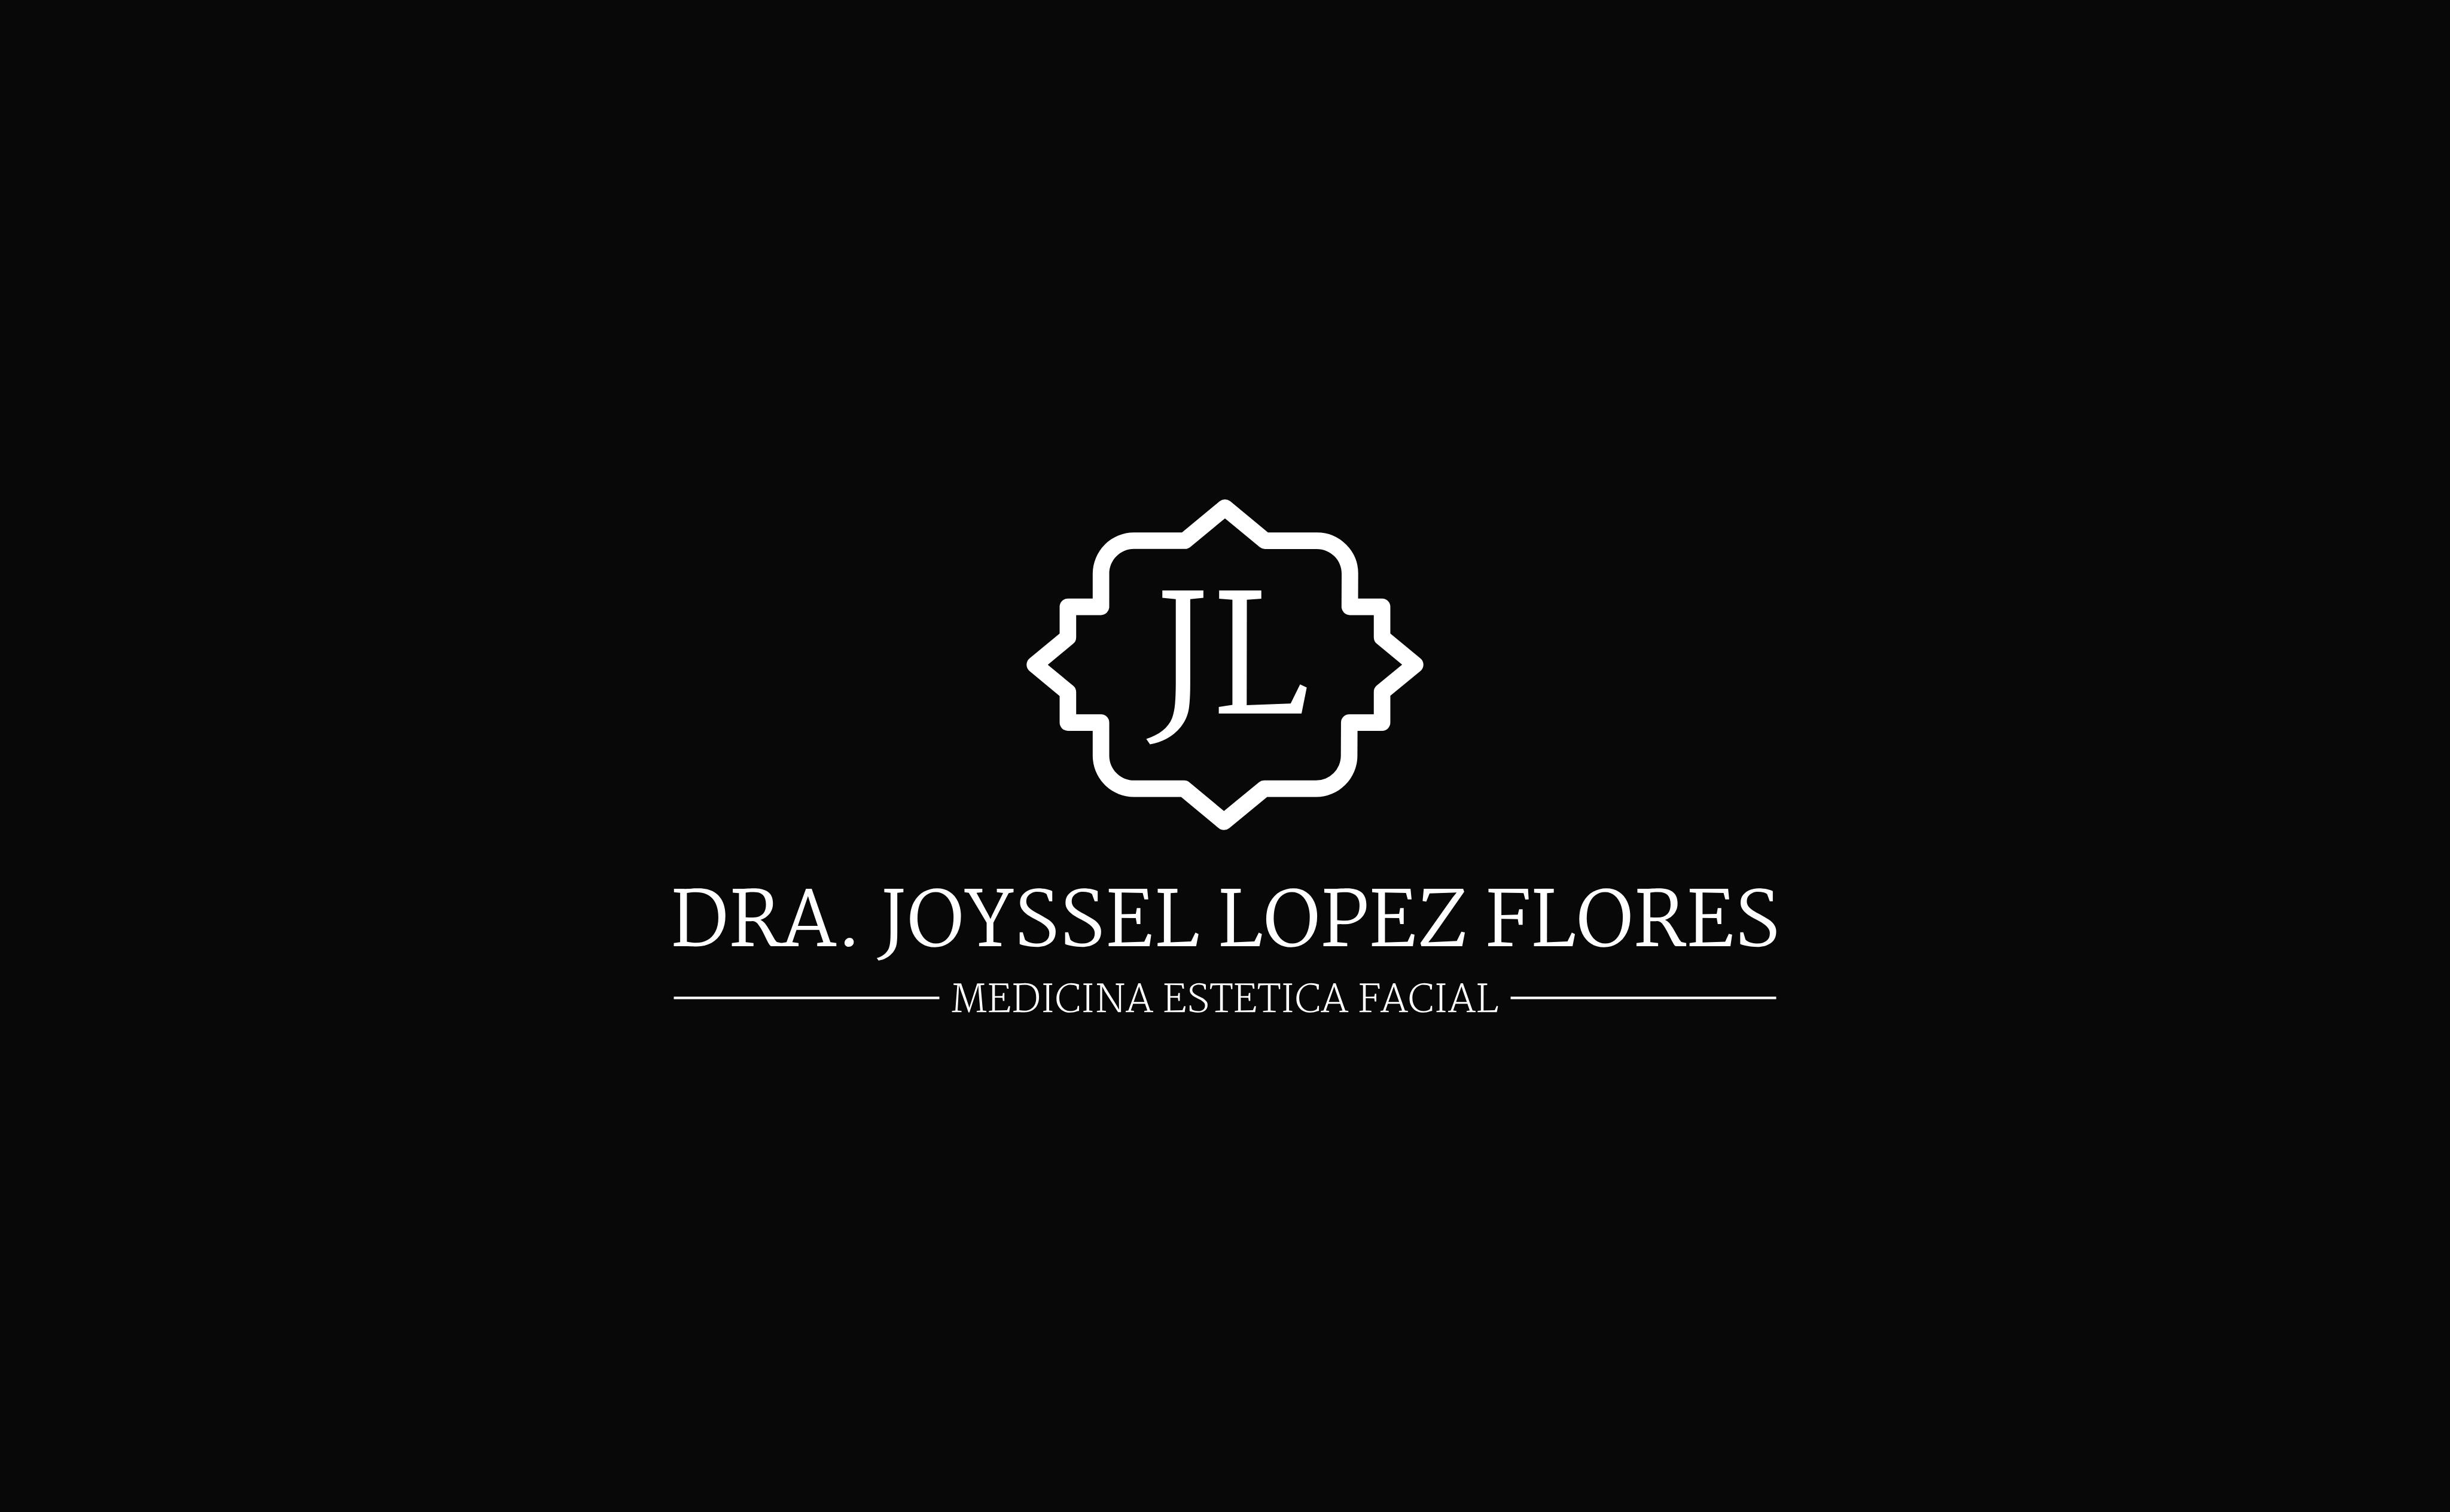 Dra. Joyssel López Flores. Medicina Estética Facial.